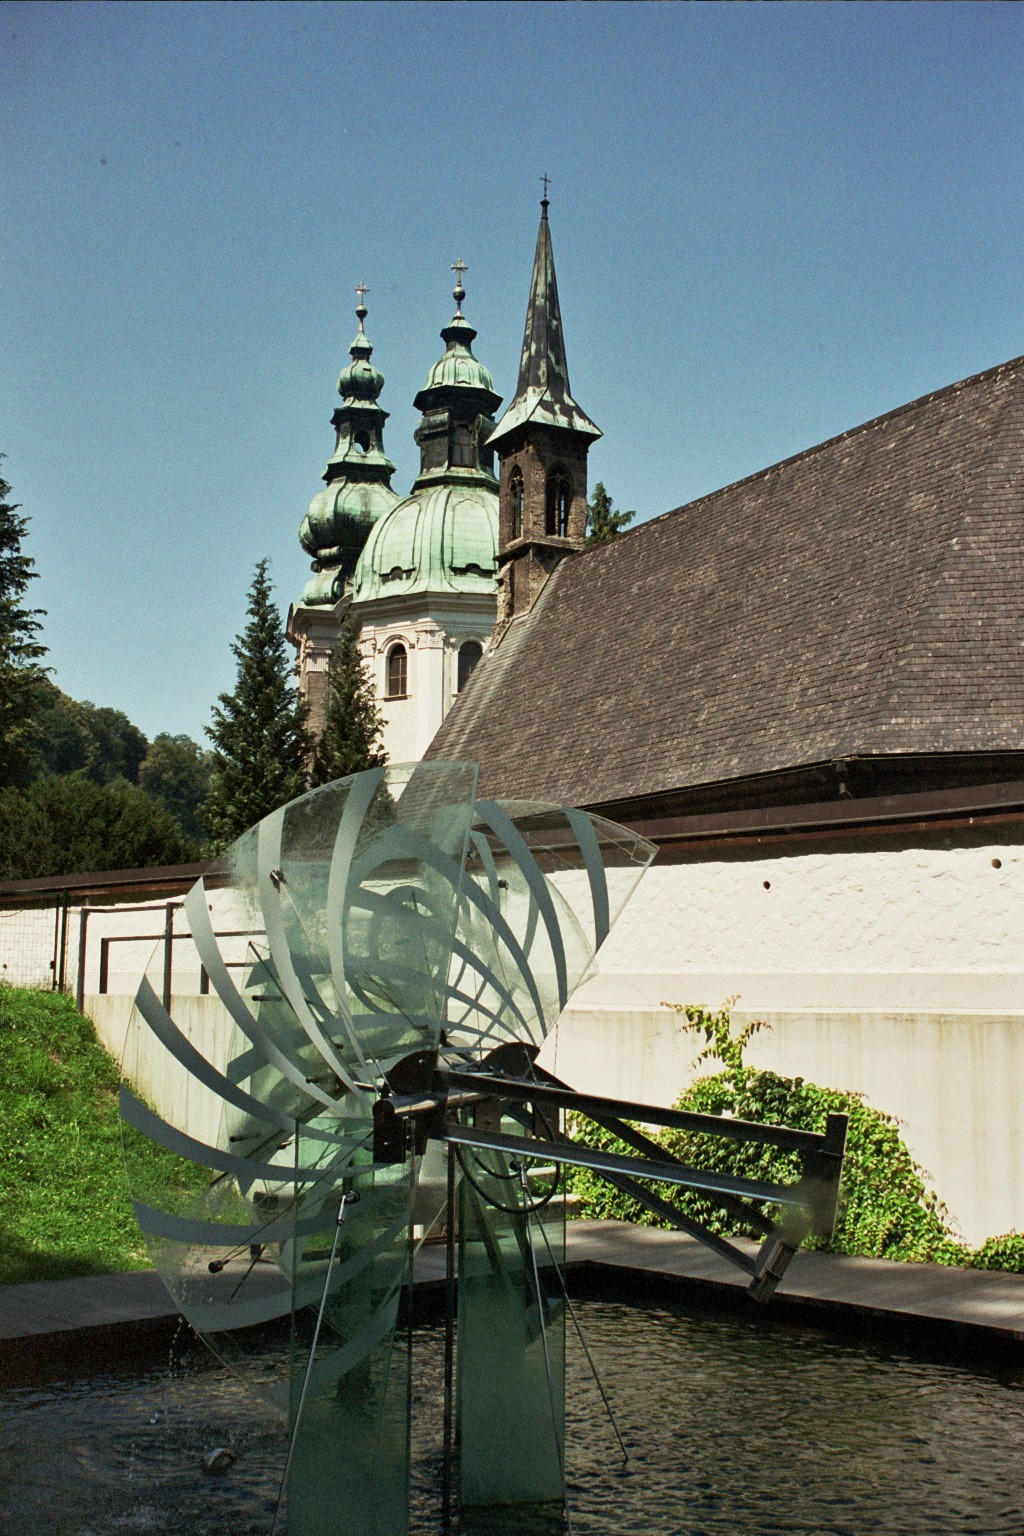 St. Peter's Abbey, Salzburg, Austria